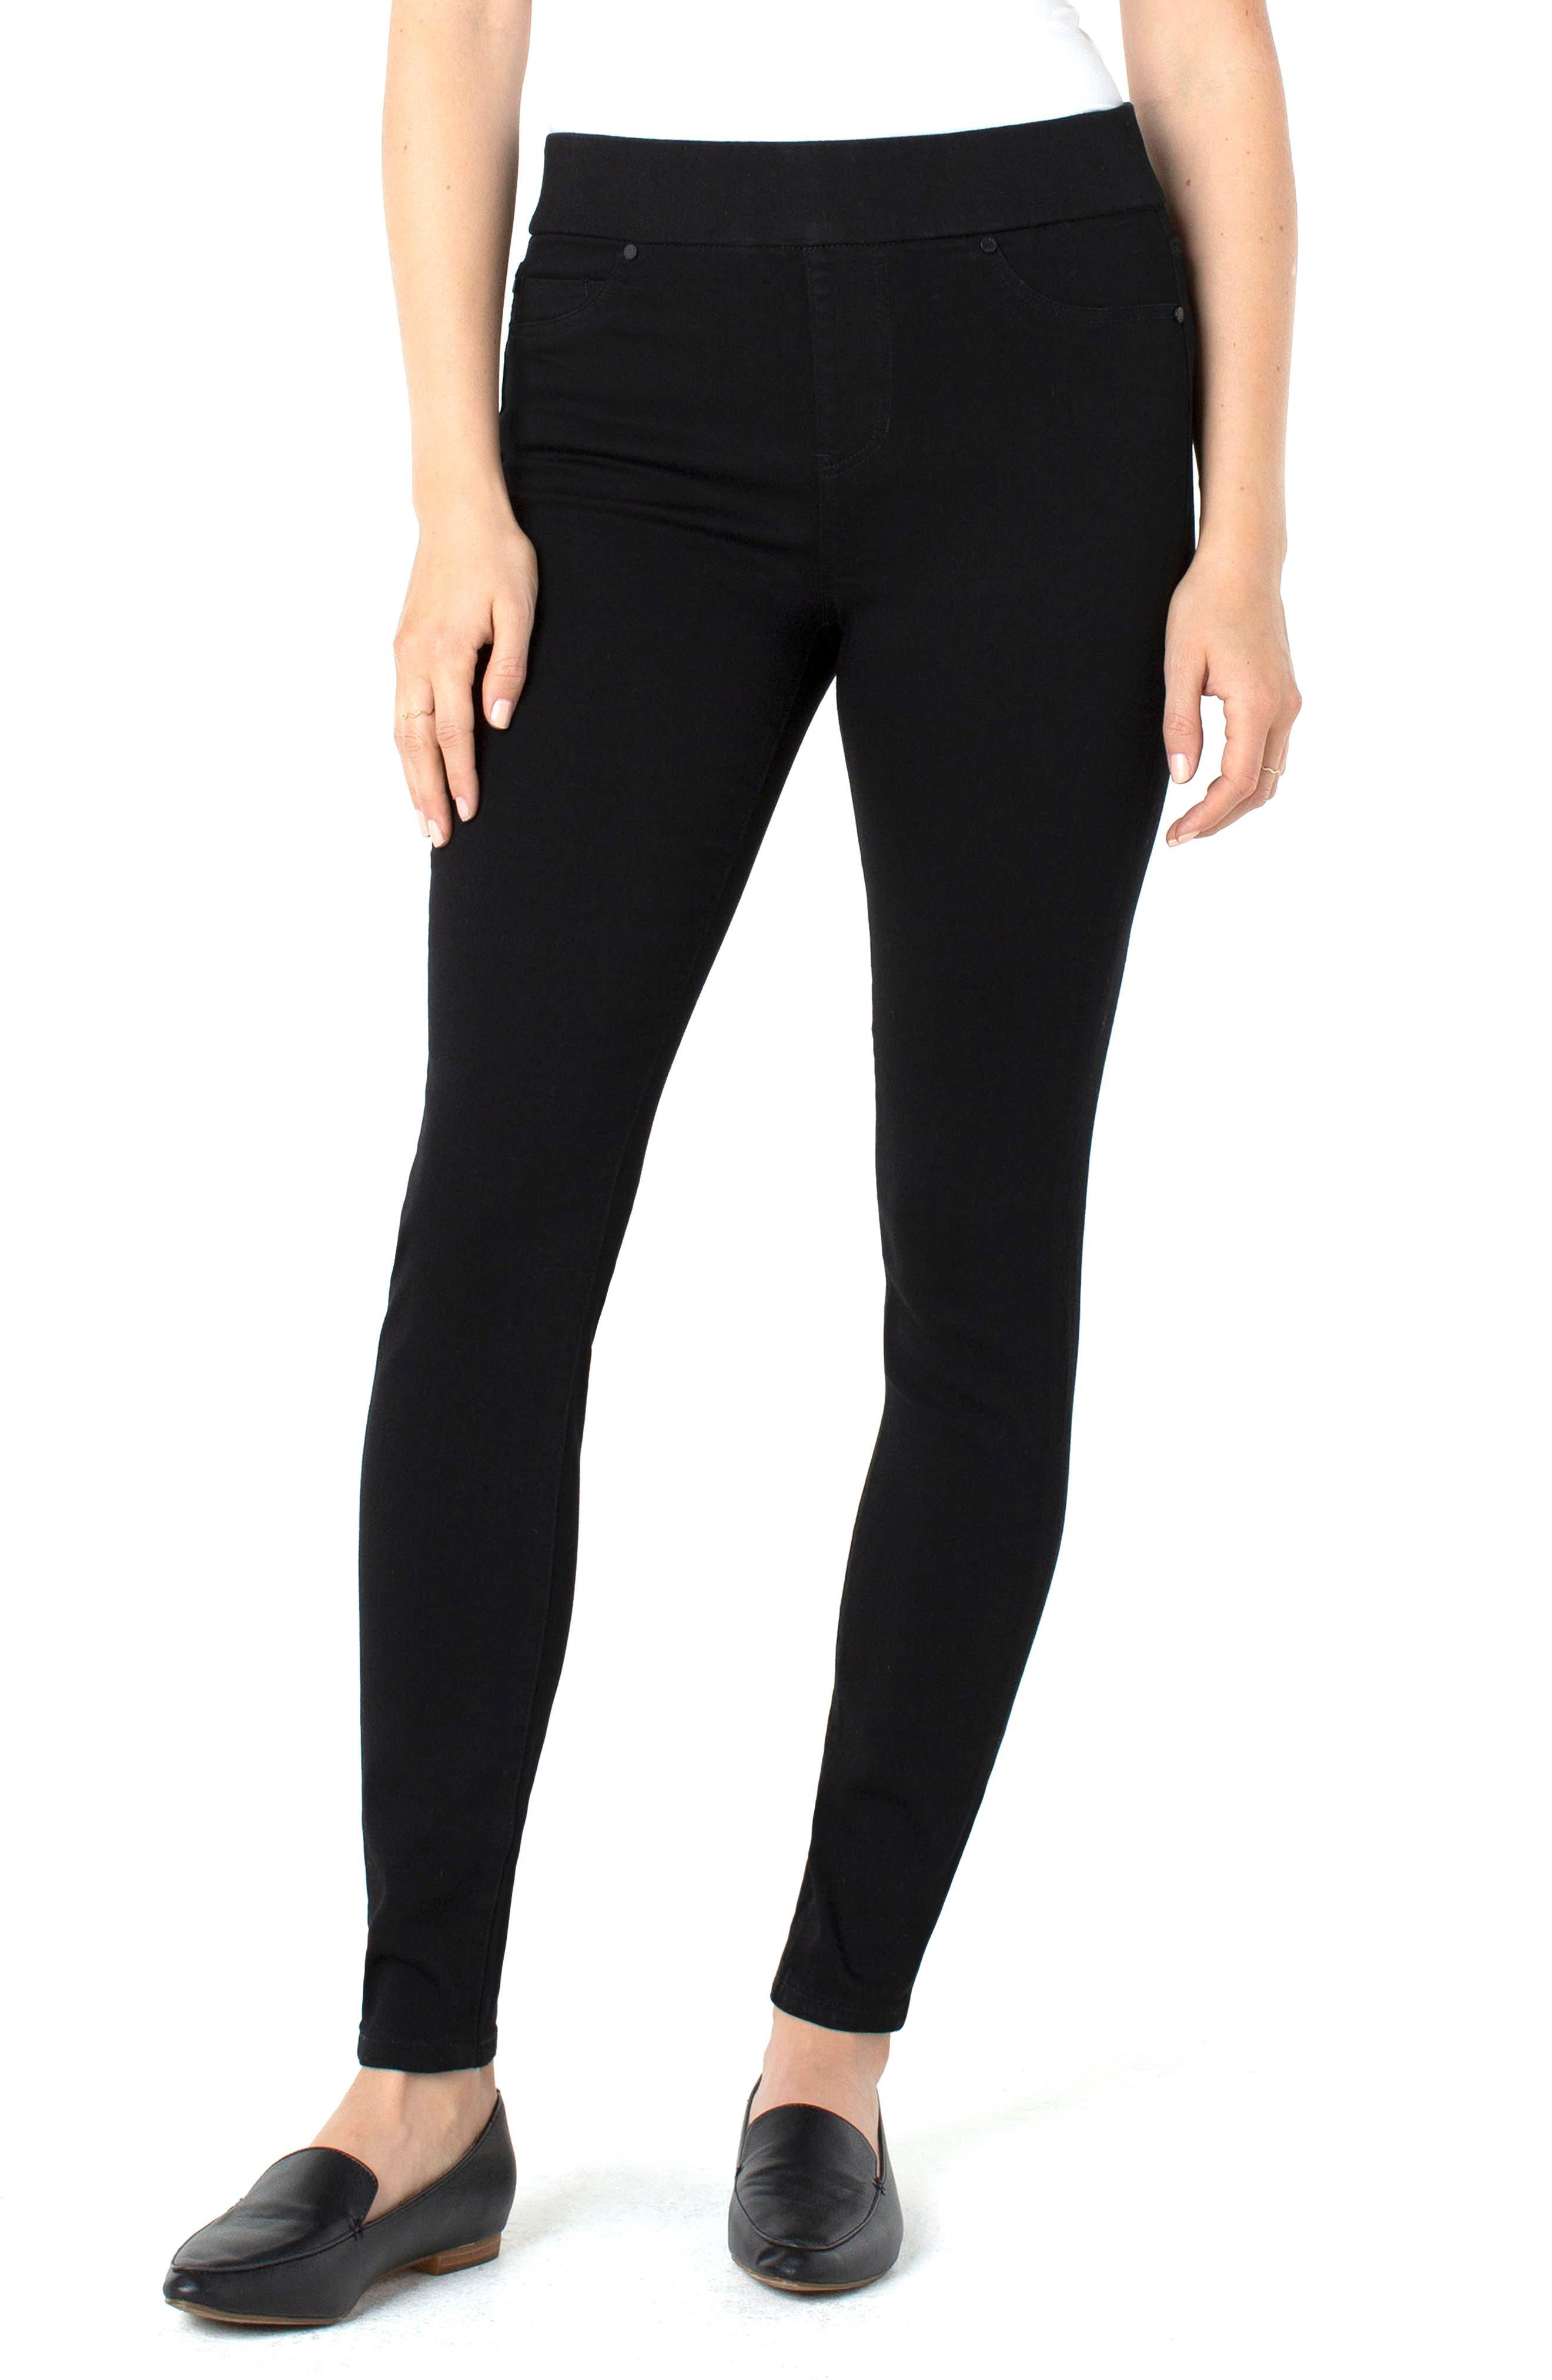 Jeans Company Sienna Pull-On Knit Denim Leggings